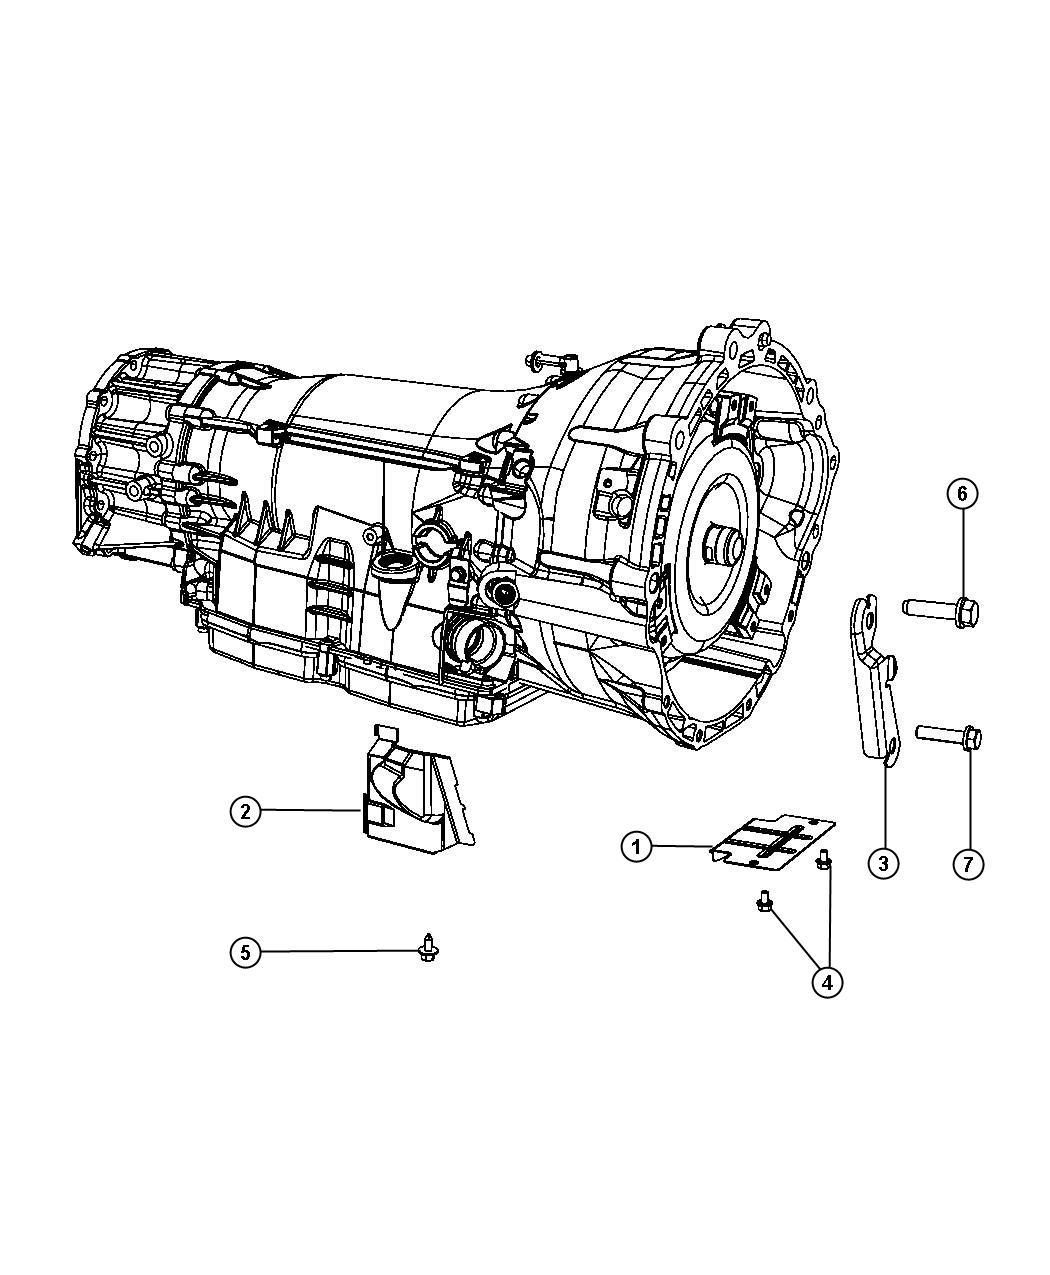 2011 dodge nitro shield  heat   transmission - 5-spd automatic   connector shield